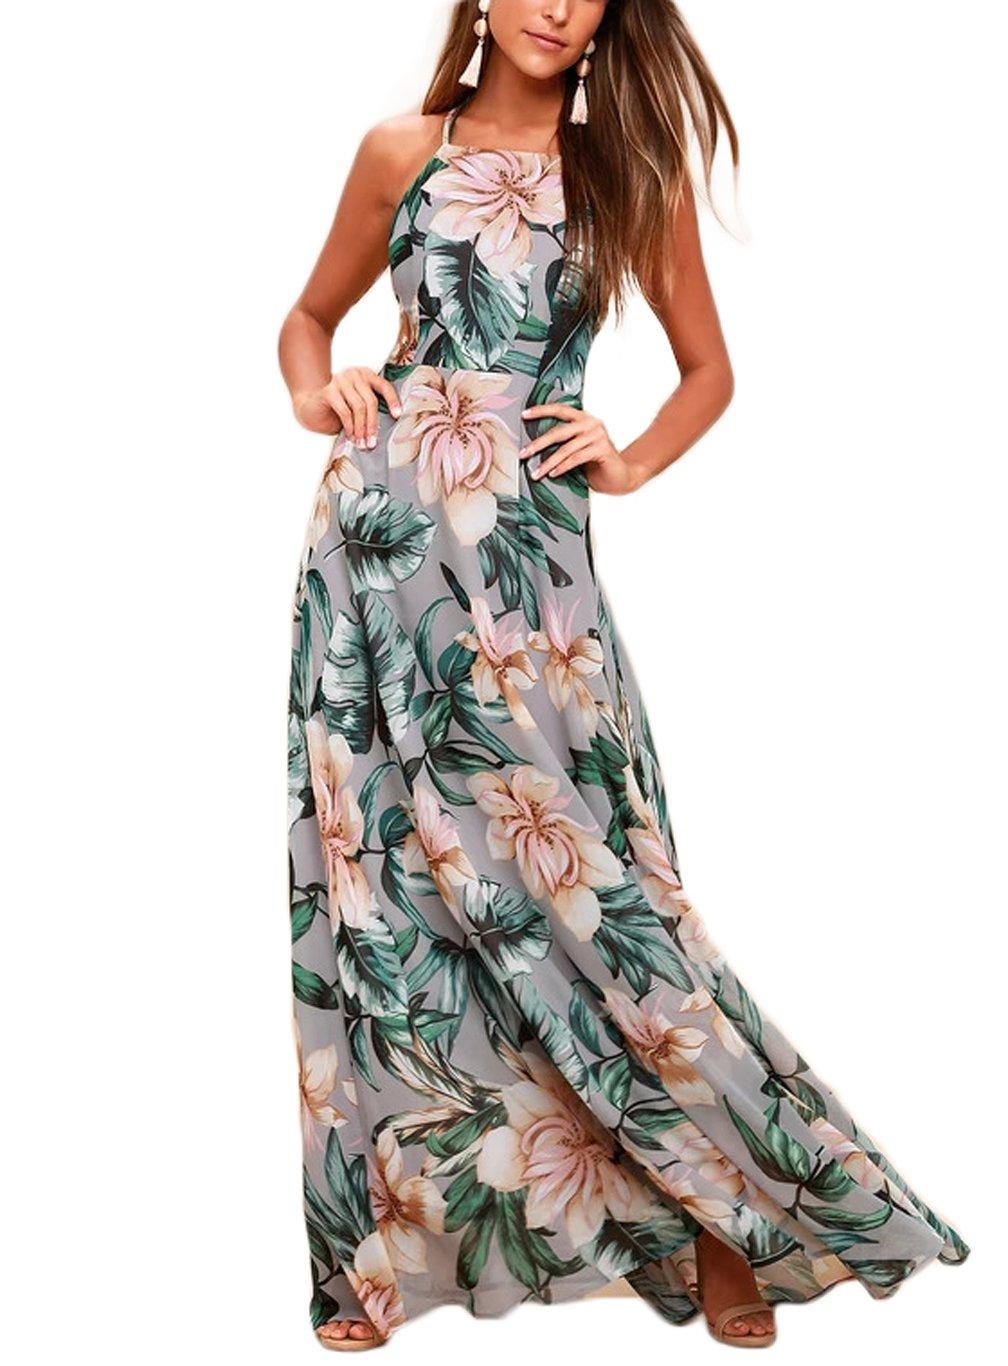 NERLEROLIAN Women's Sleeveless Halter Neck Sexy Floral Print Maxi Dress for Summer Graygreen-M